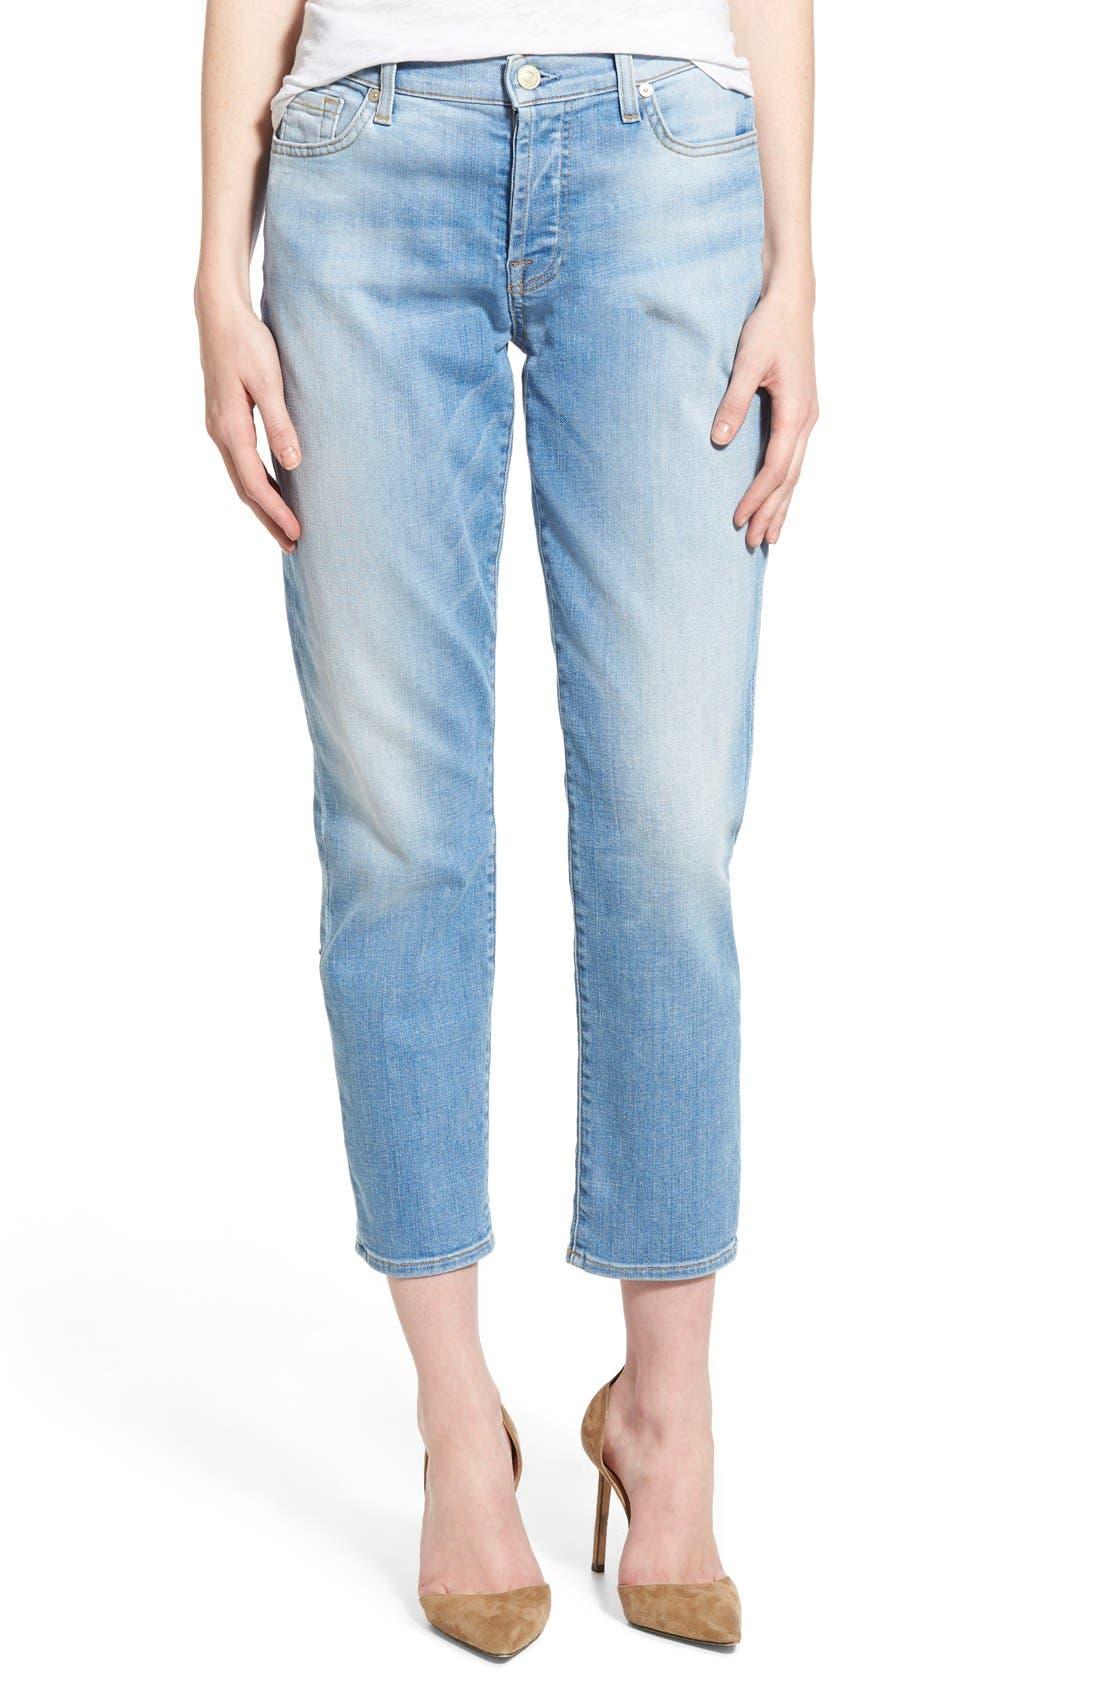 Main Image - 7 For All Mankind® 'Josefina' Mid Rise Boyfriend Jeans (Mediterranean Sky)